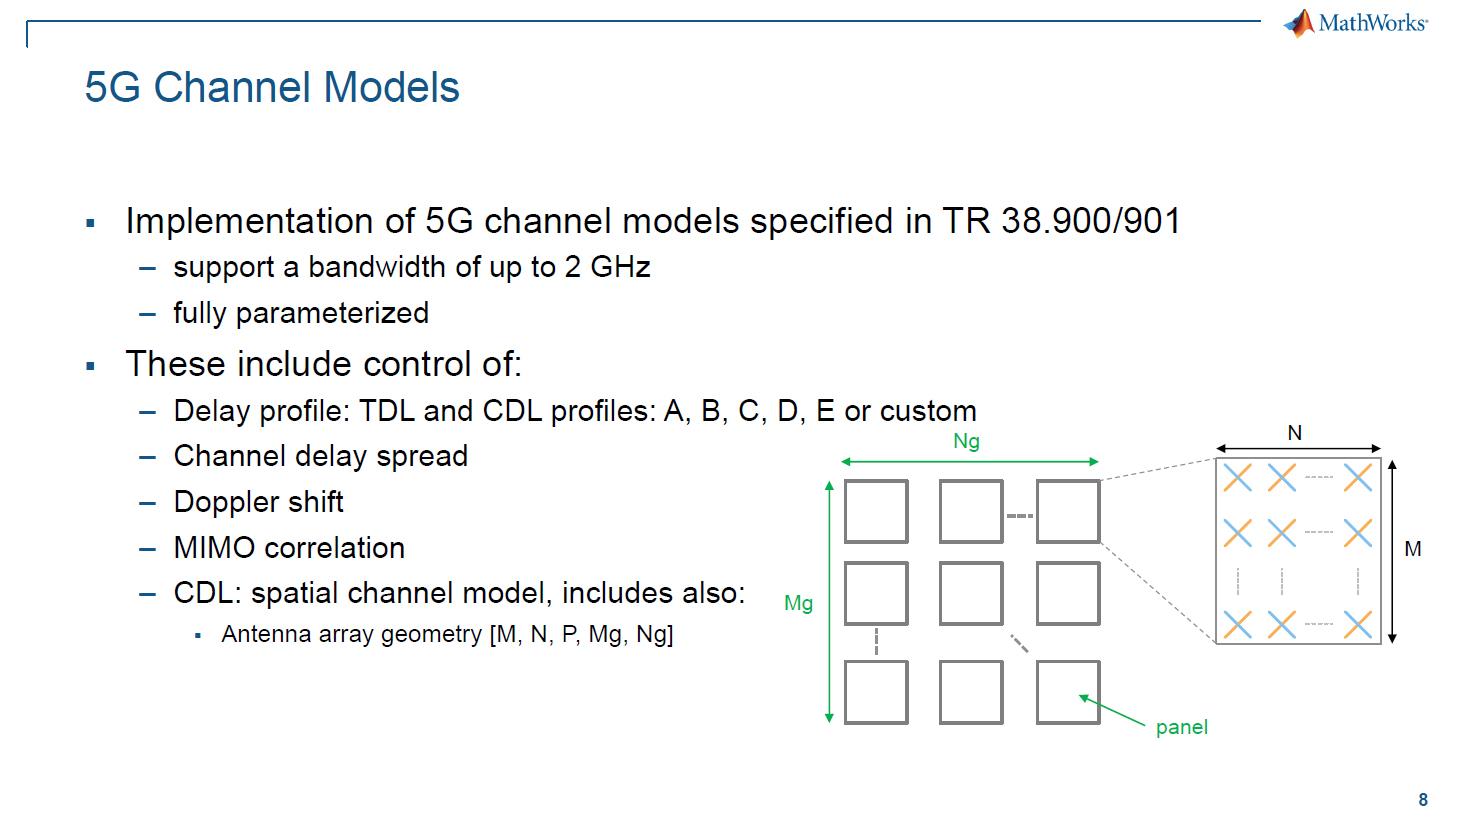 MATLABではじめる容易な5G開発 - 5G向けライブラリの無償提供が